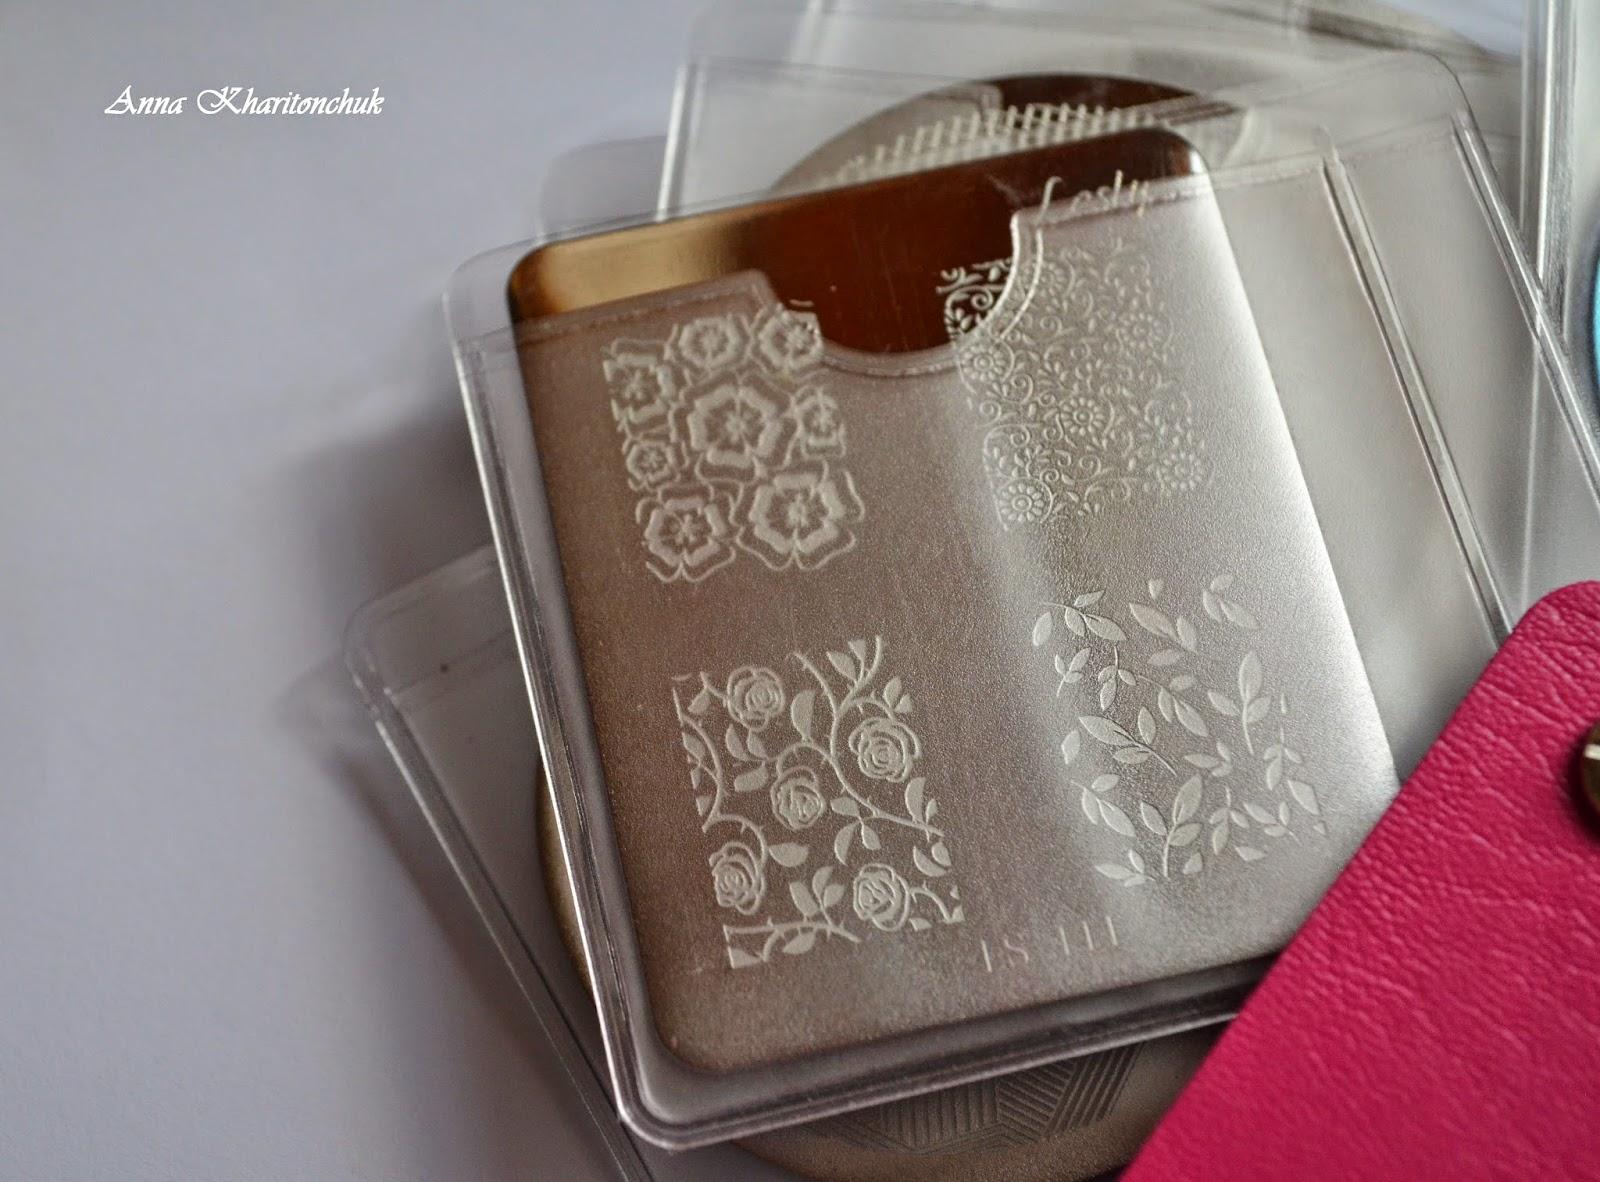 Холдер для хранения пластин для стемпинга -  24 Slots Nail Art Stamping Plate Holder Organizer Concise Pattern